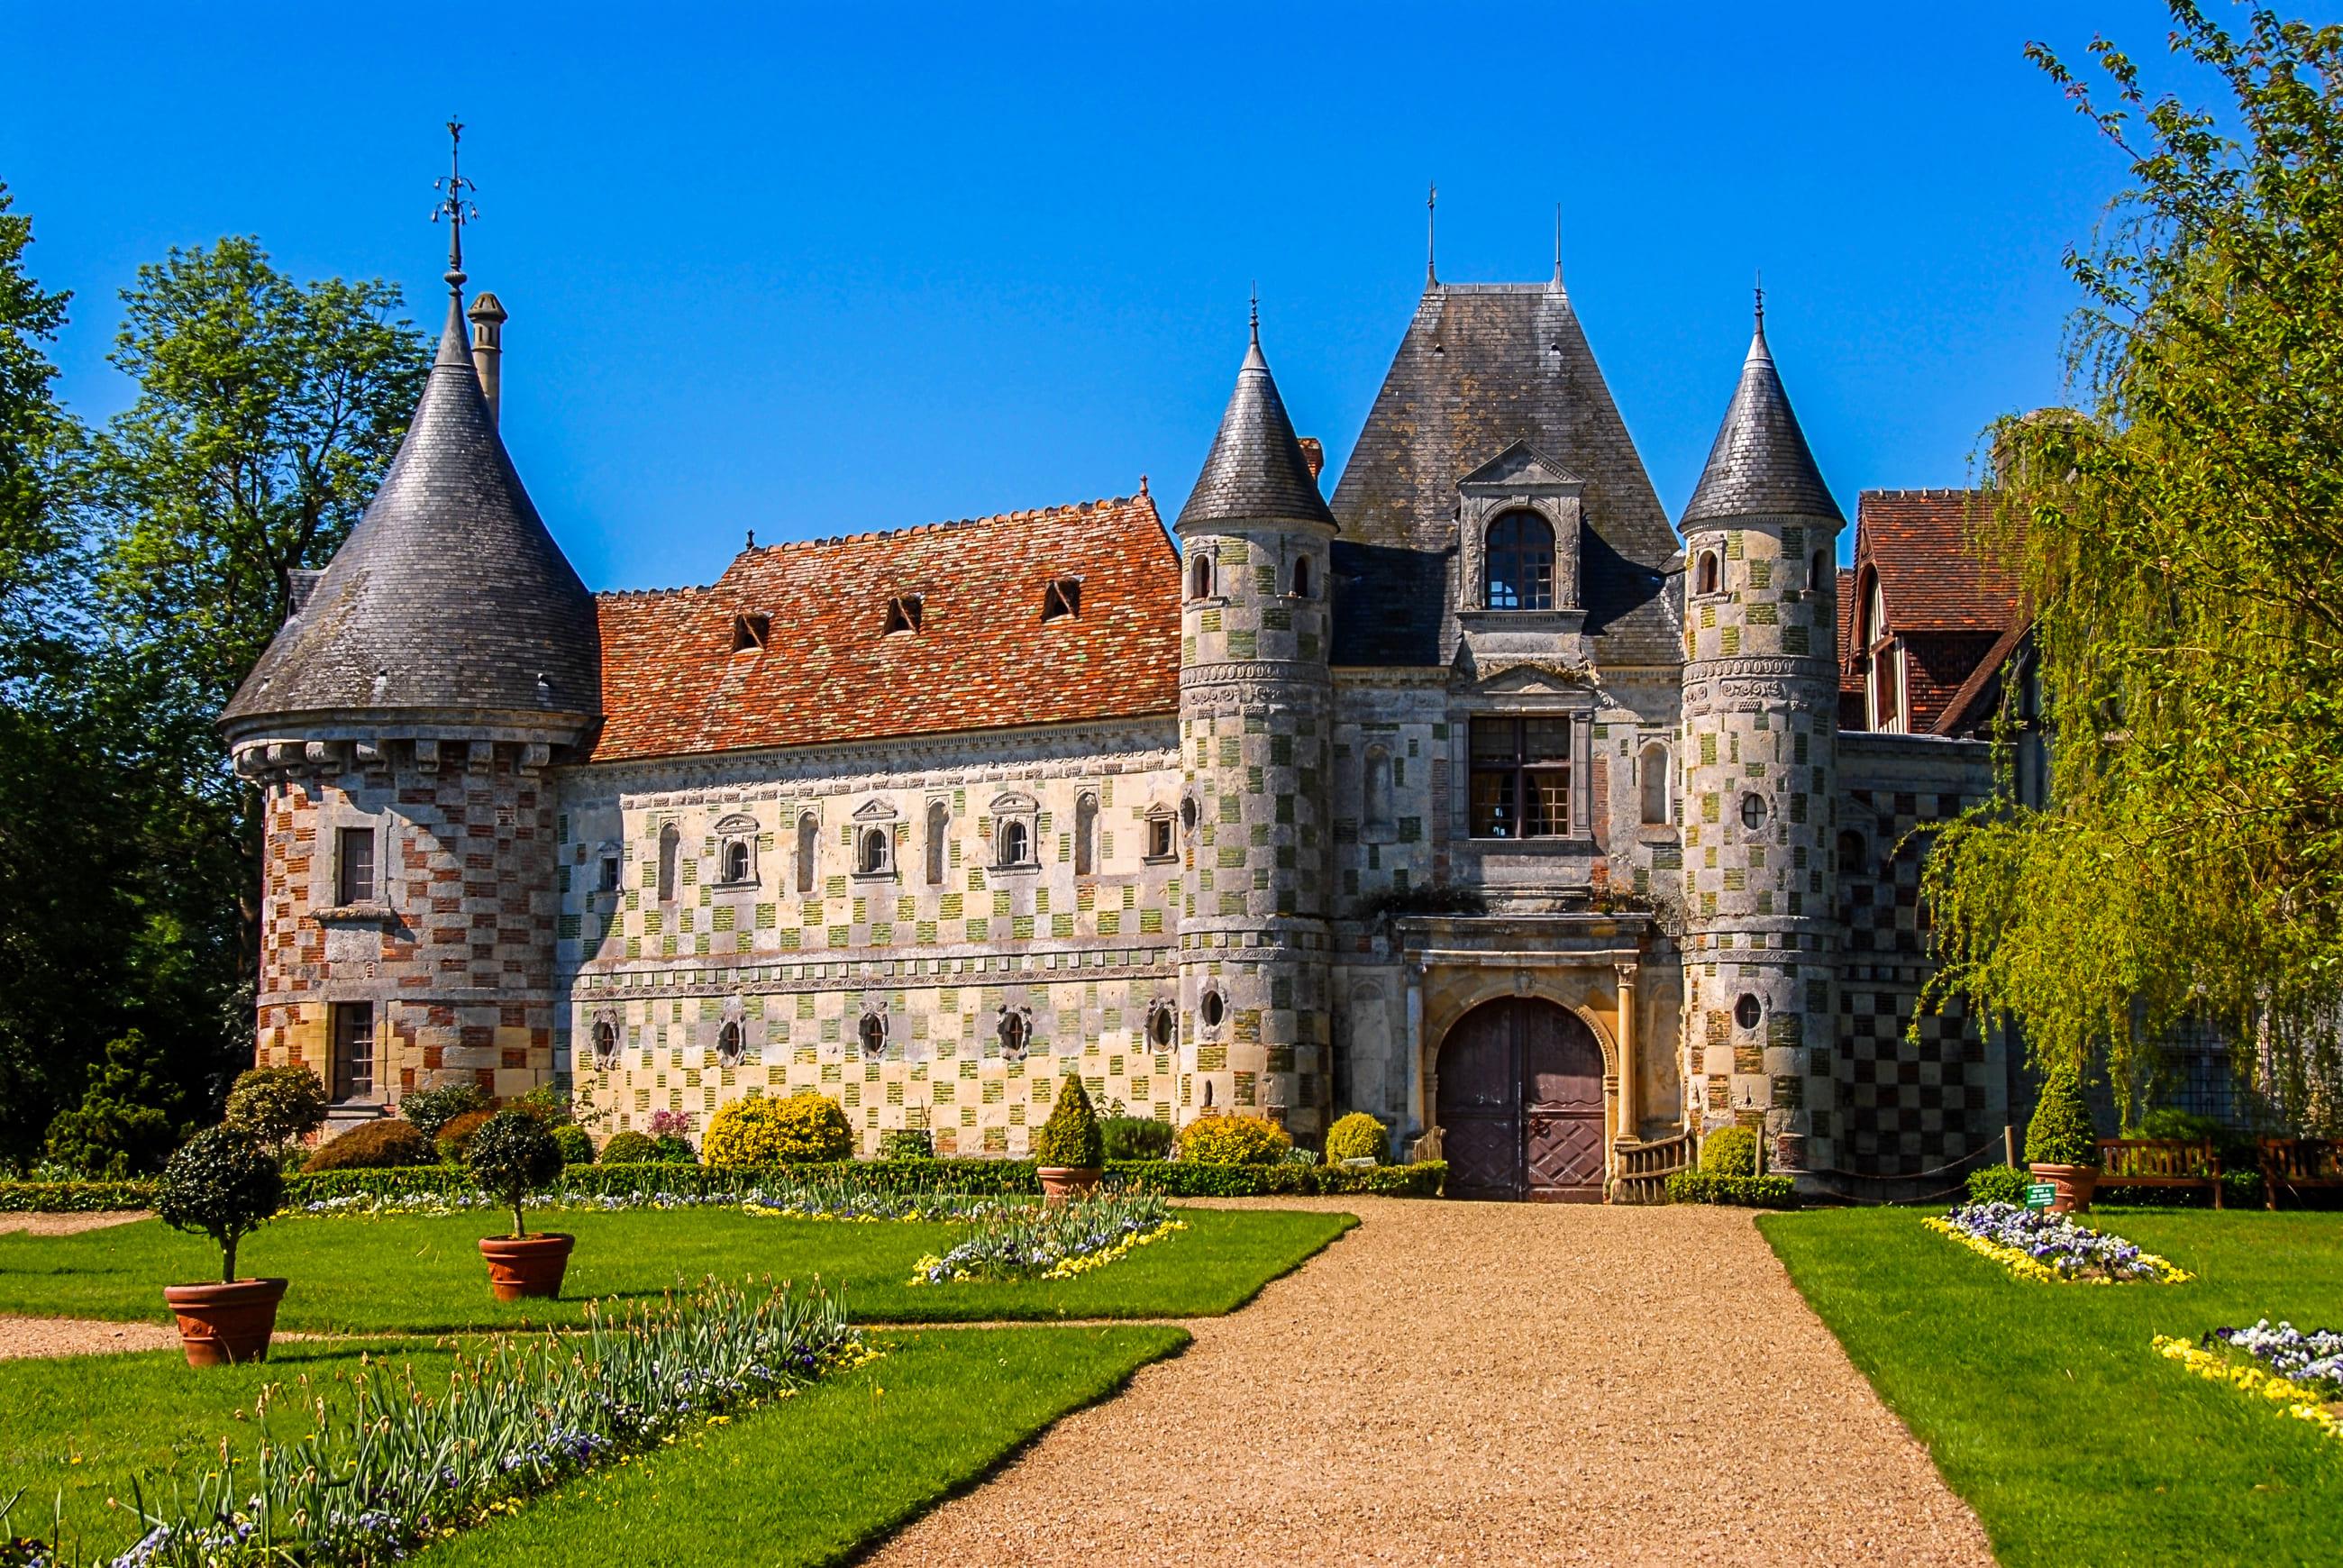 HDoboi.Kiev.ua - Франция, замок в Лизье Chateau de St Germain de Livet